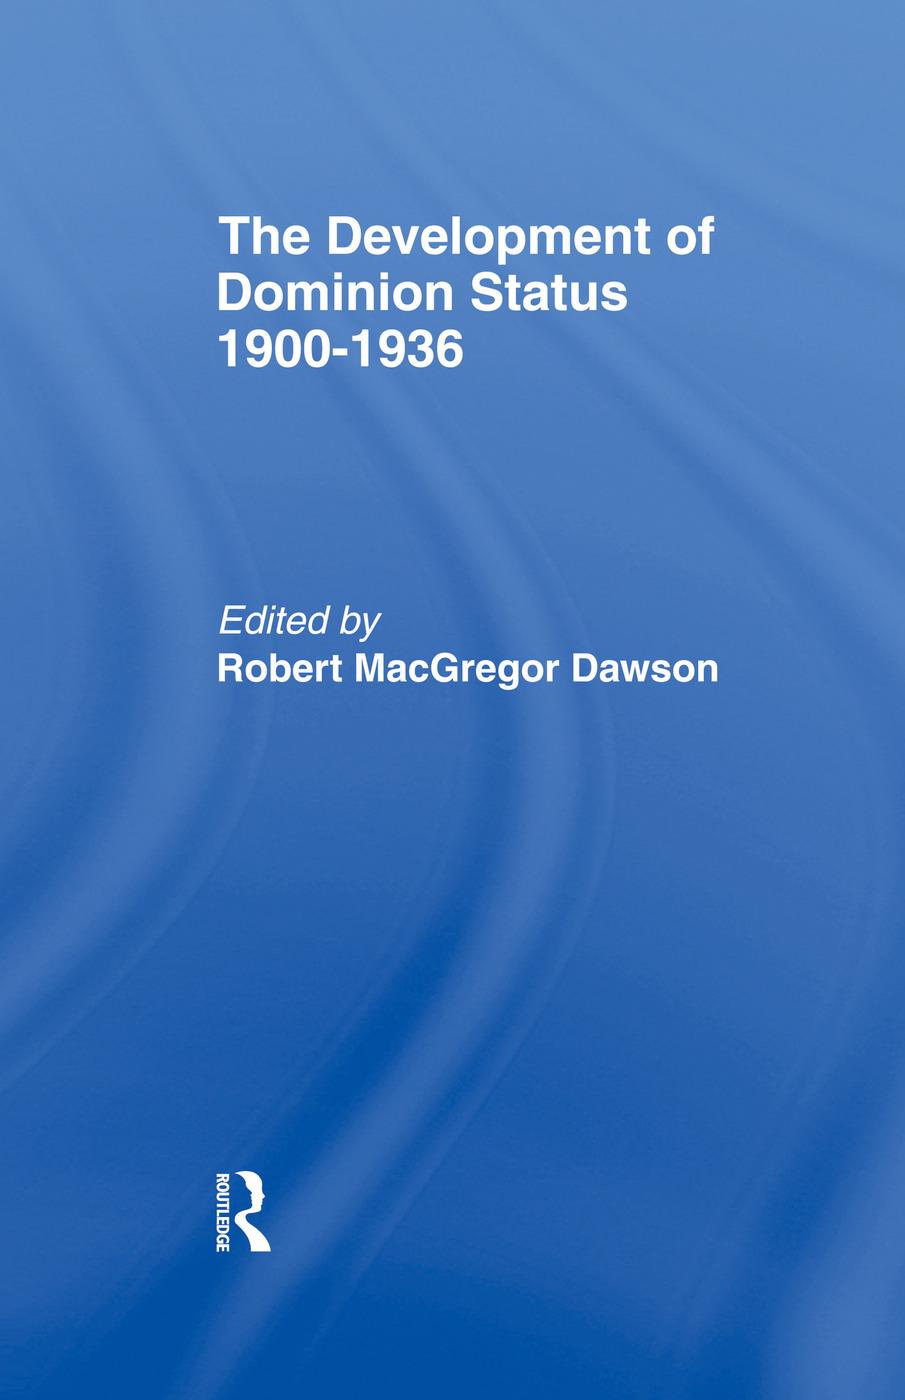 Development of Dominion Status 1900-1936